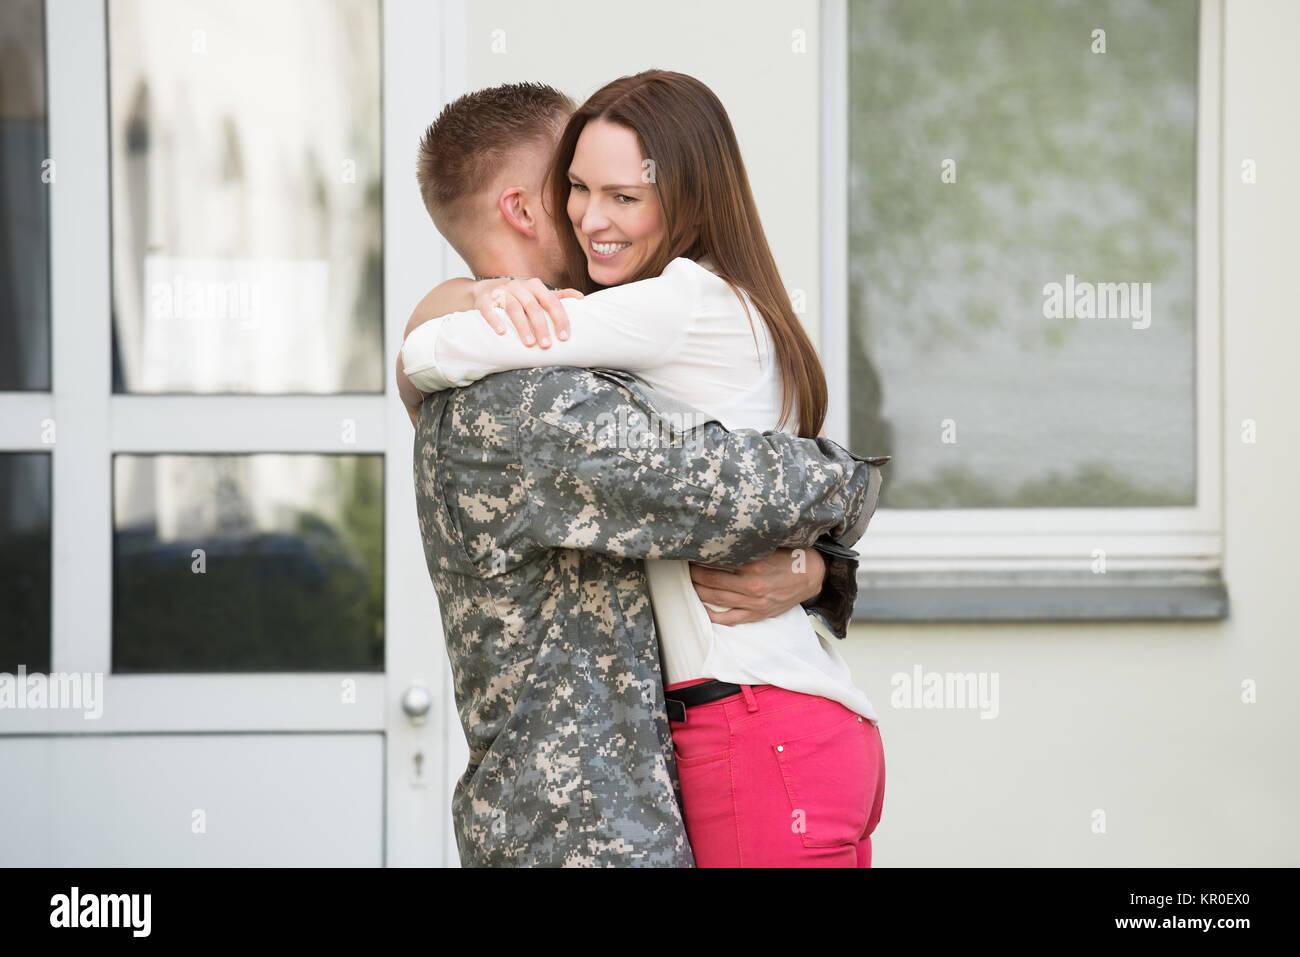 Wife Welcoming Her Husband - Stock Image